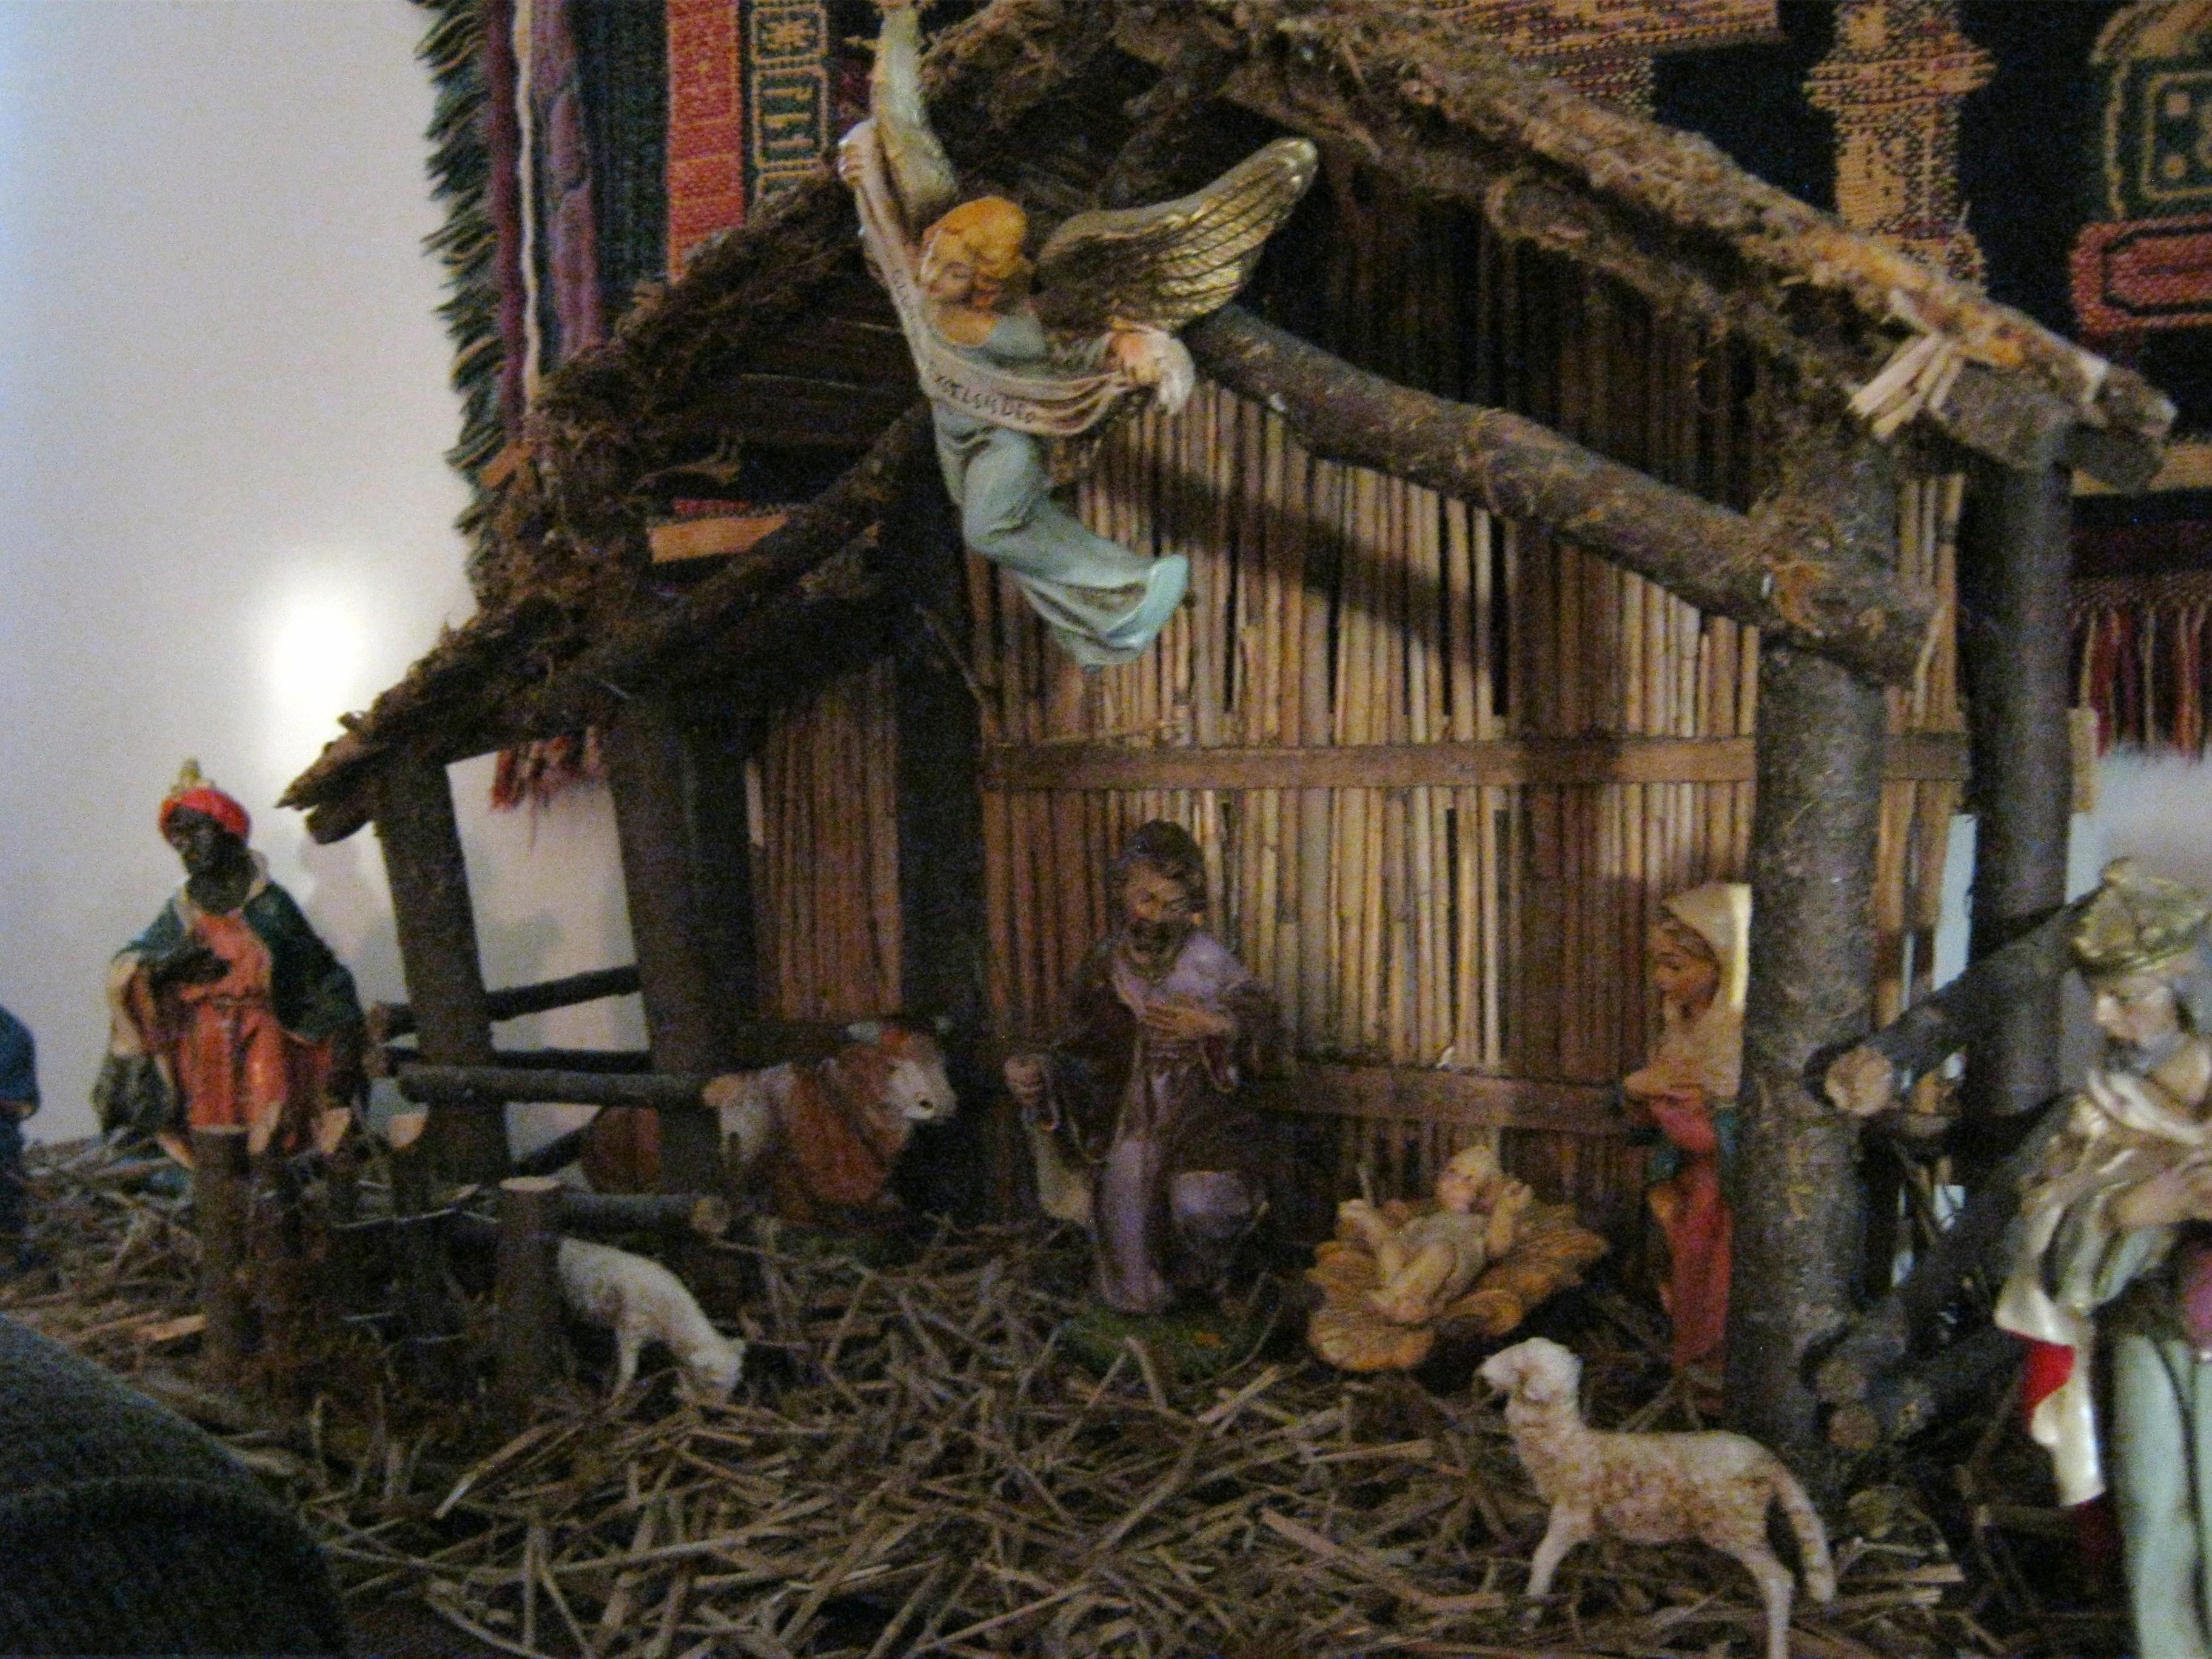 Nativity edited